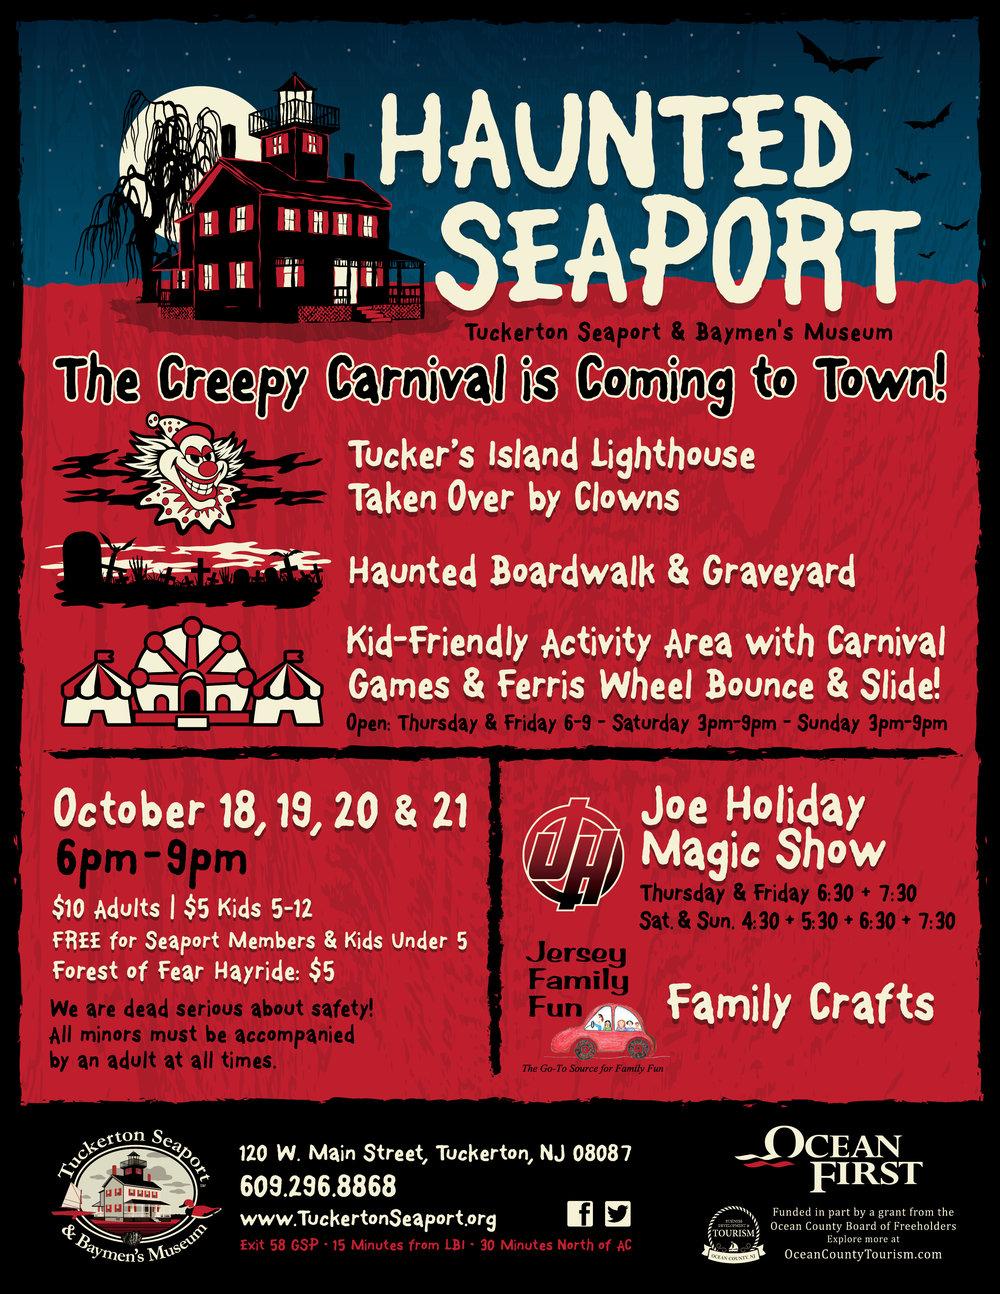 Seaport-Haunted-Seaport-2018-Flyer.jpg